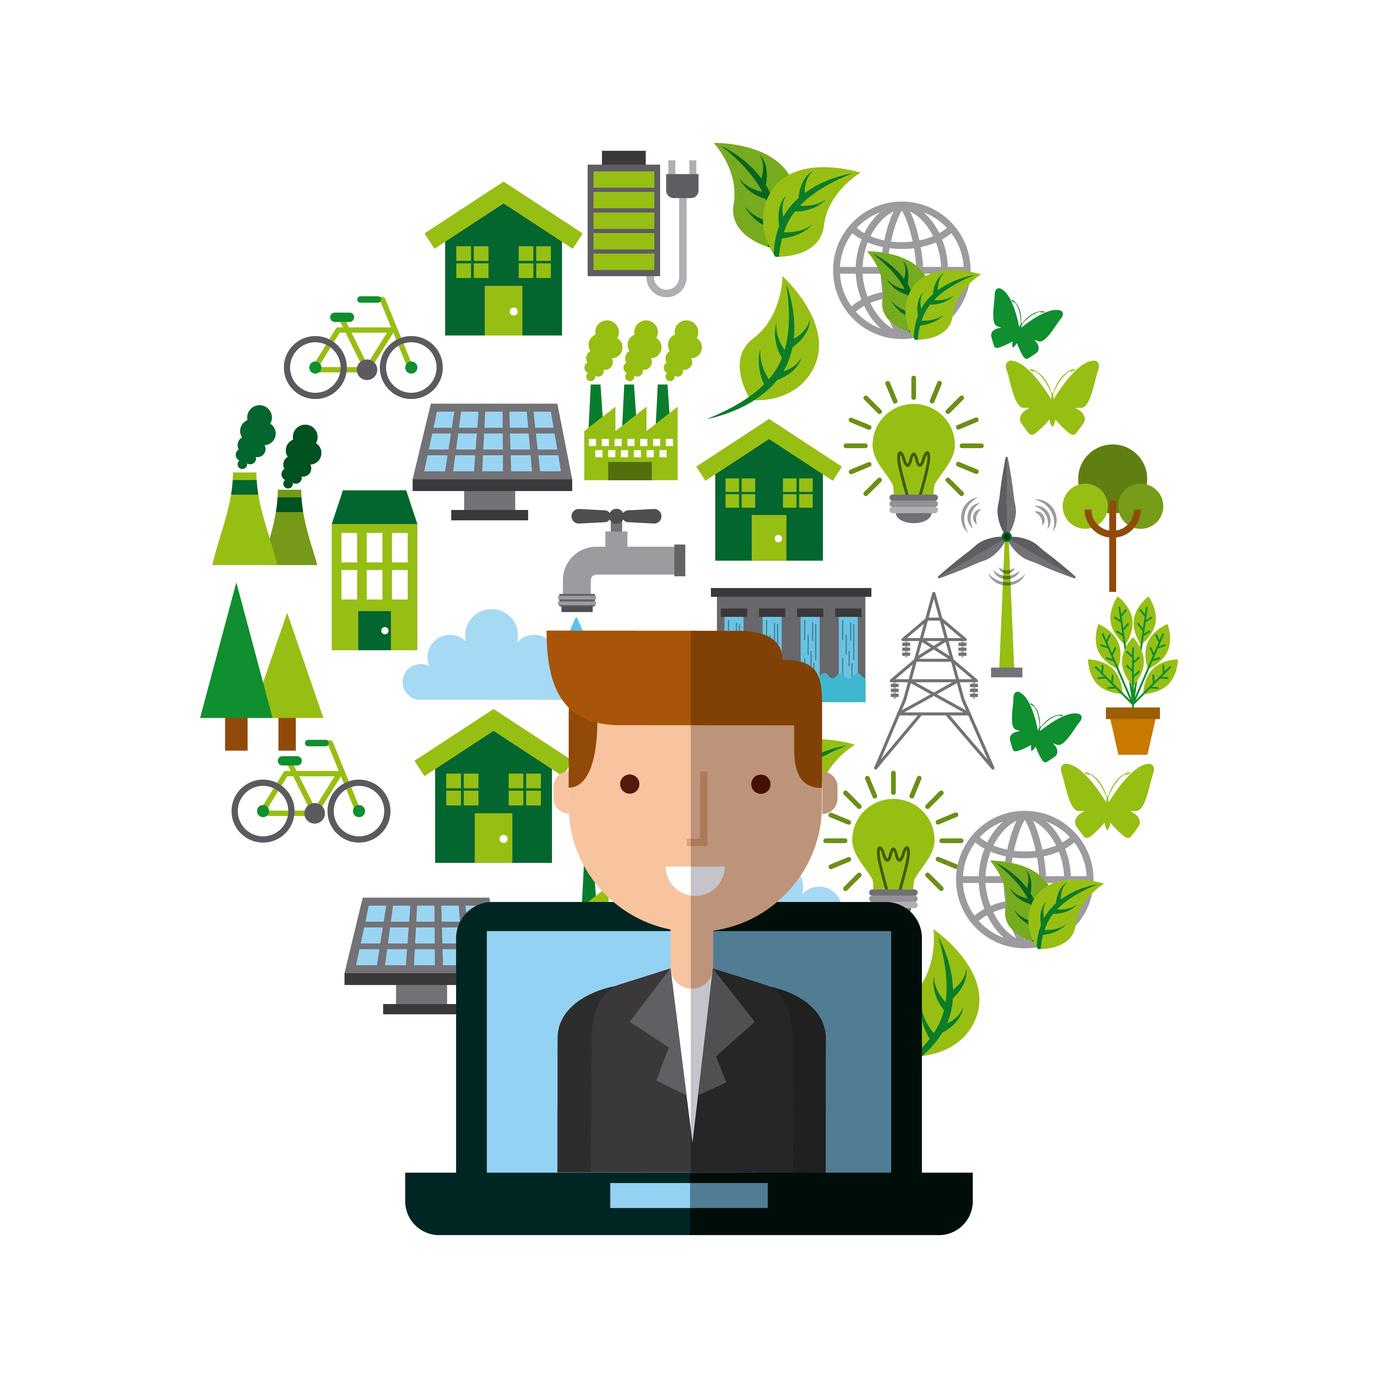 ecology and sustainability design